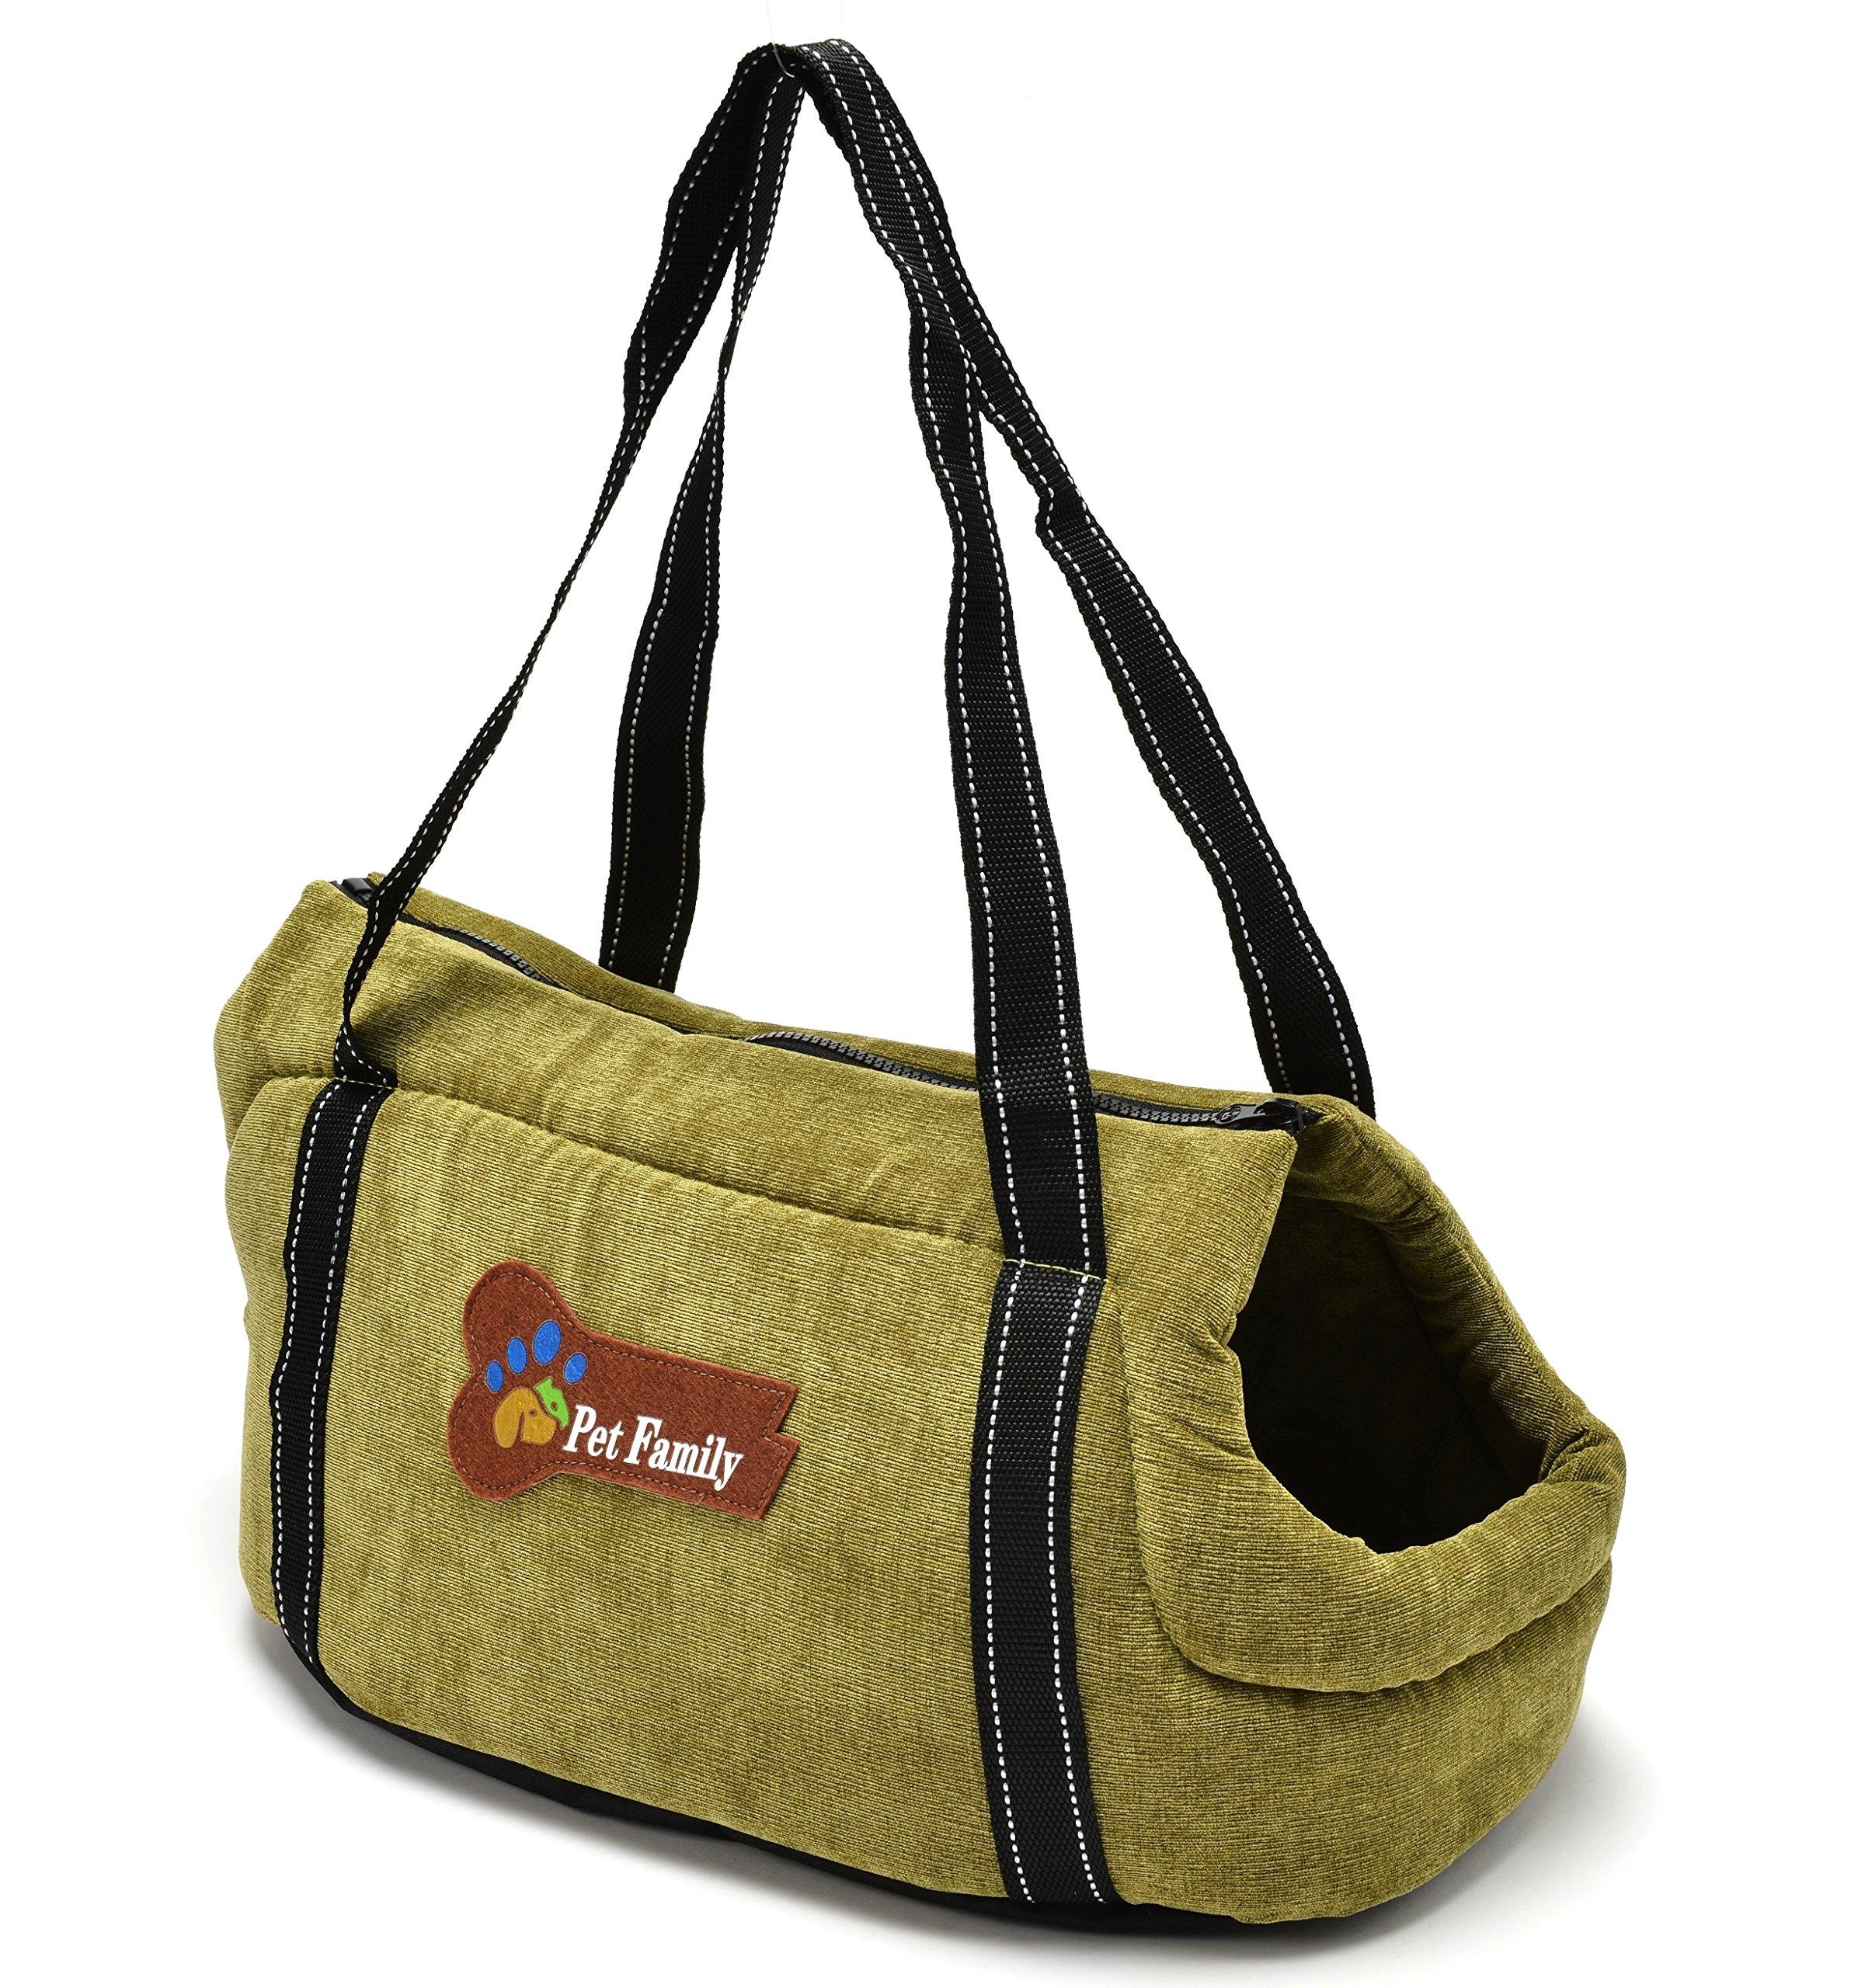 22401ad3c1 Get Quotations · Pet Cat Dog Carrier Travel Tote Shoulder Soft Bag Purse